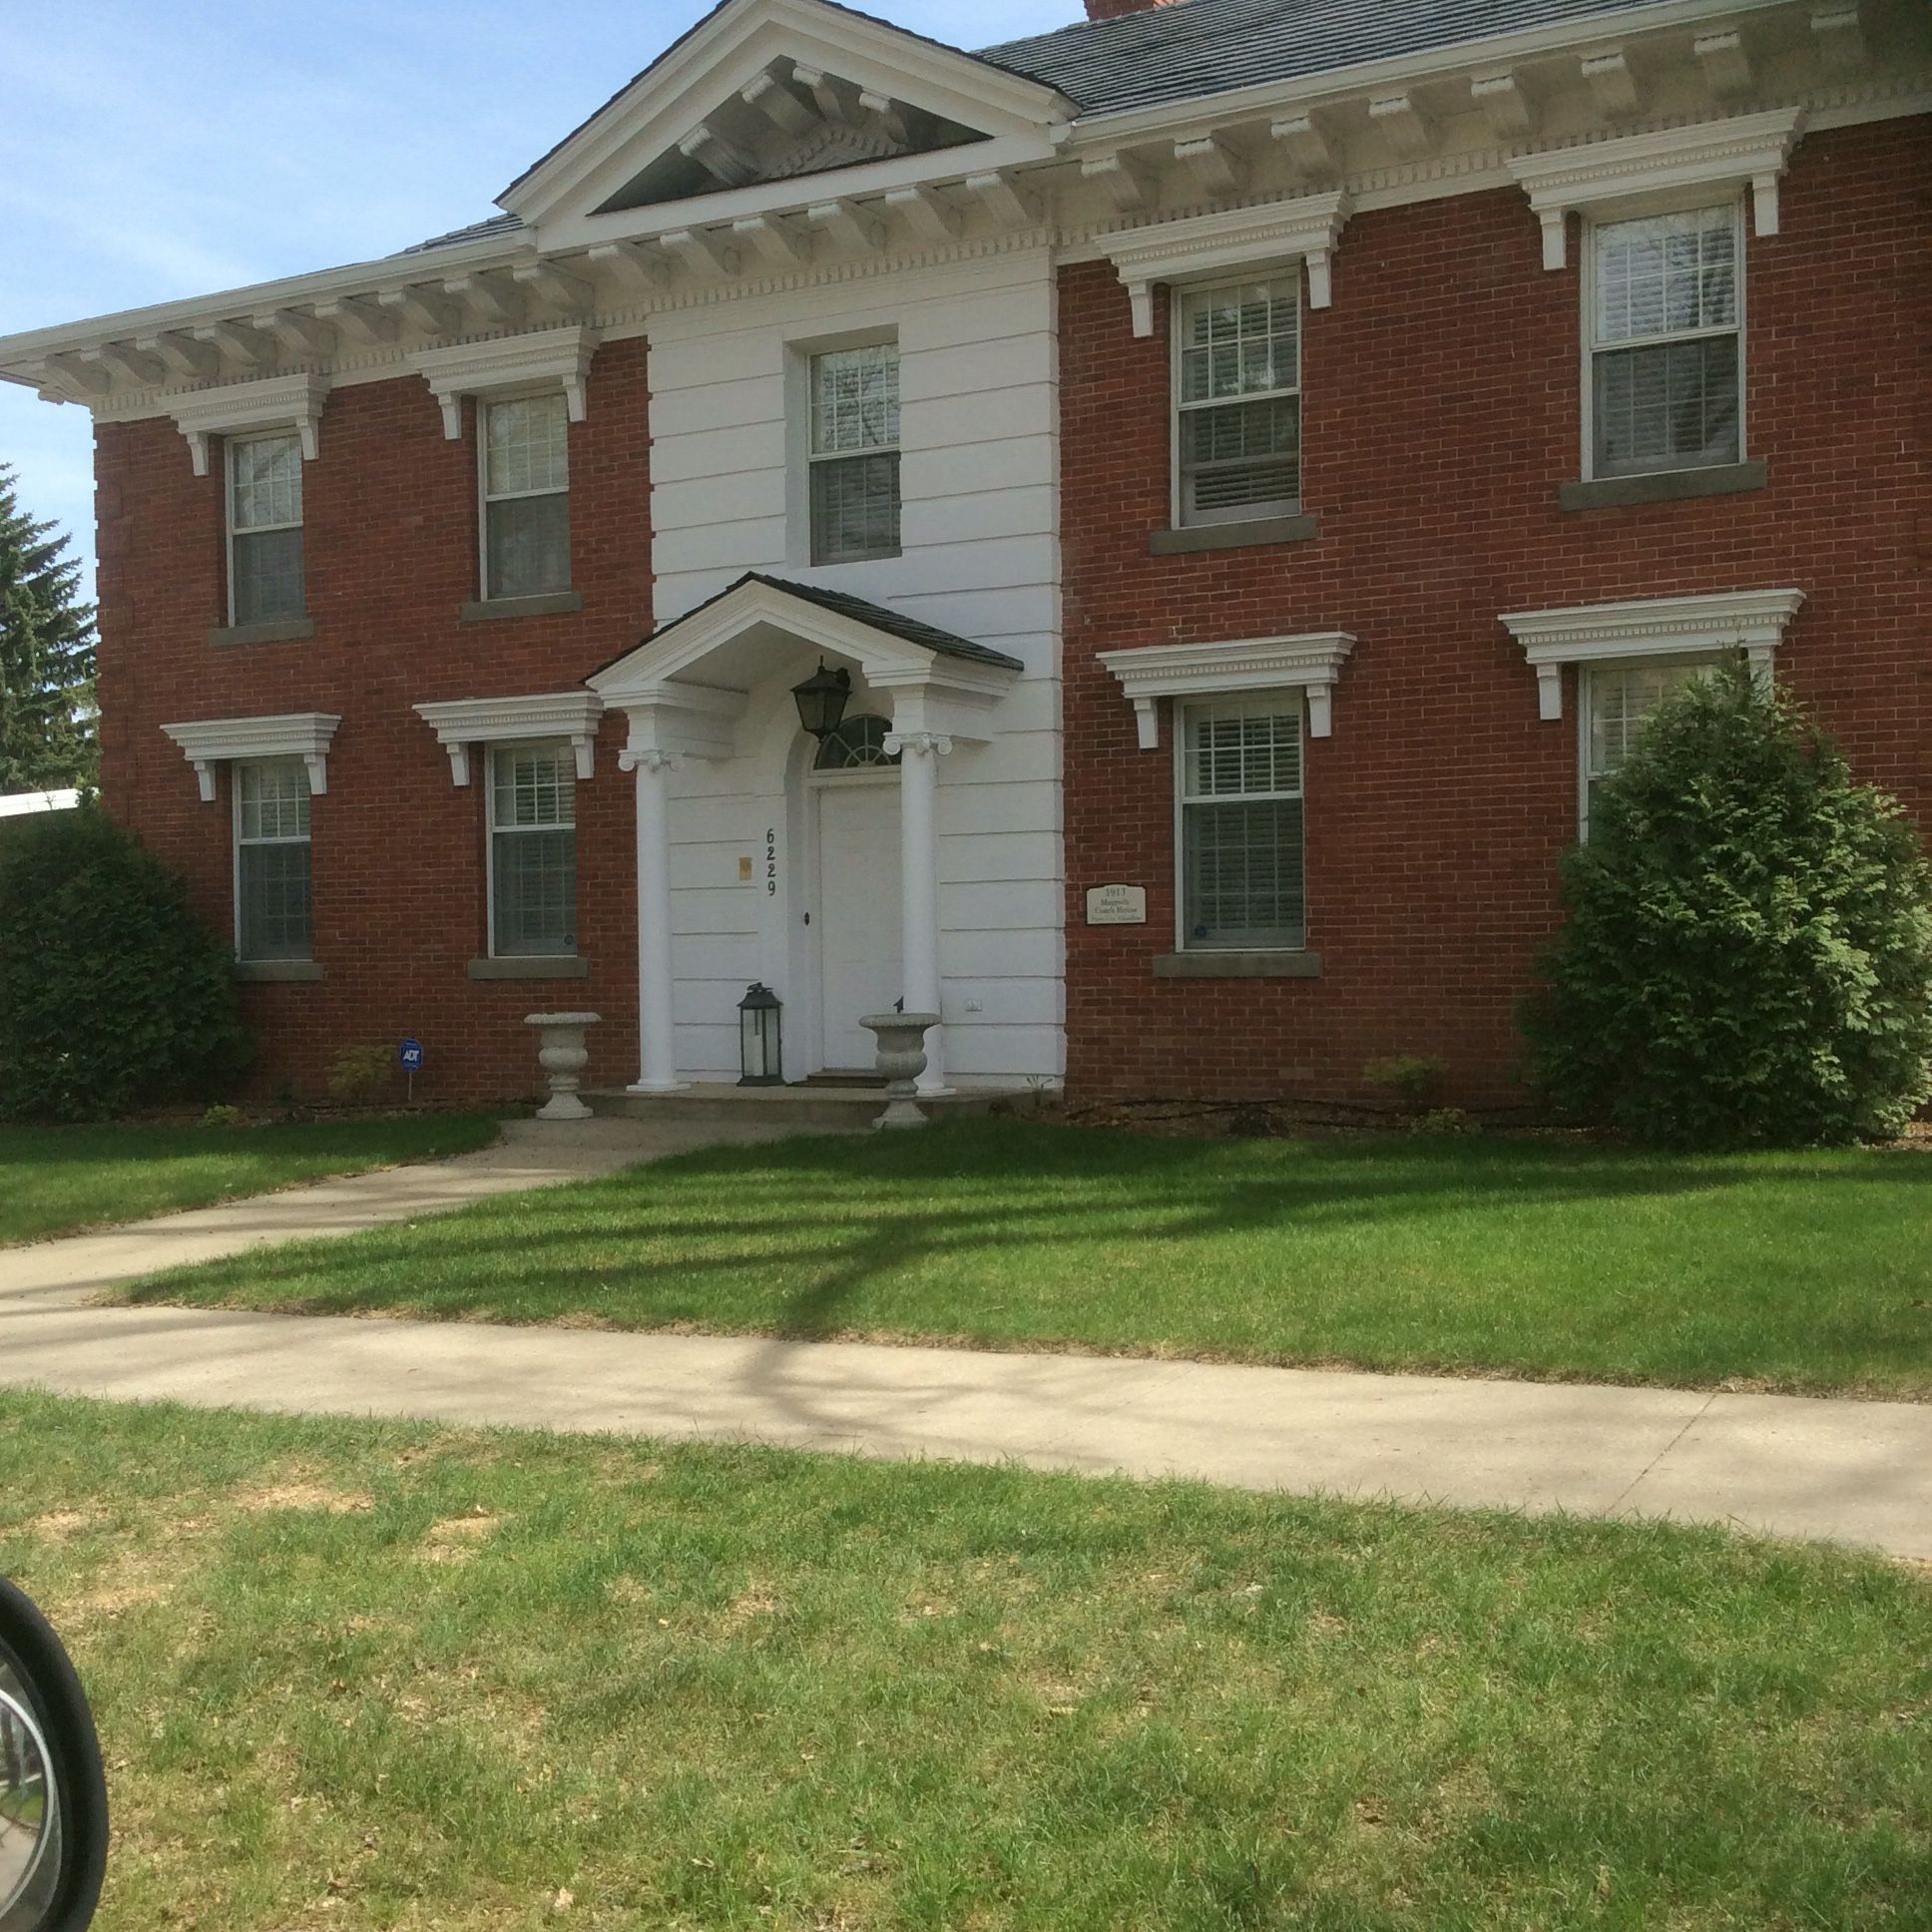 The Magrath Mansion